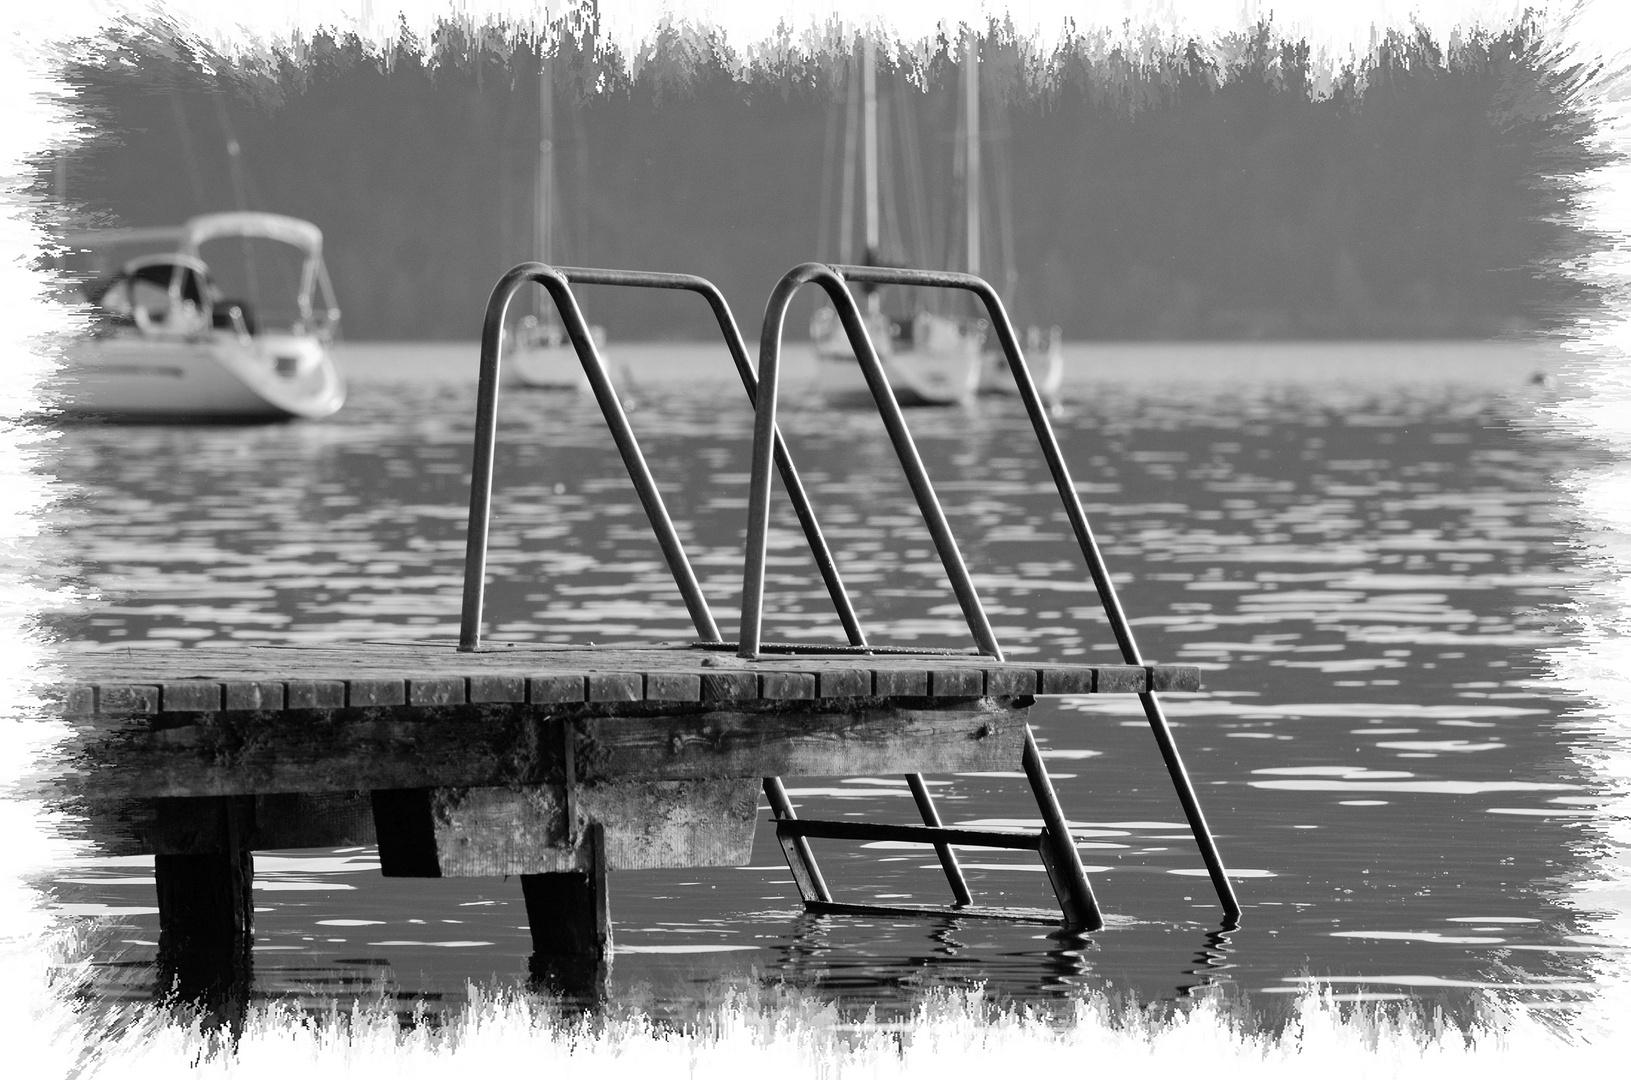 Badesteg Loibichl am Mondsee , 25.09.2013